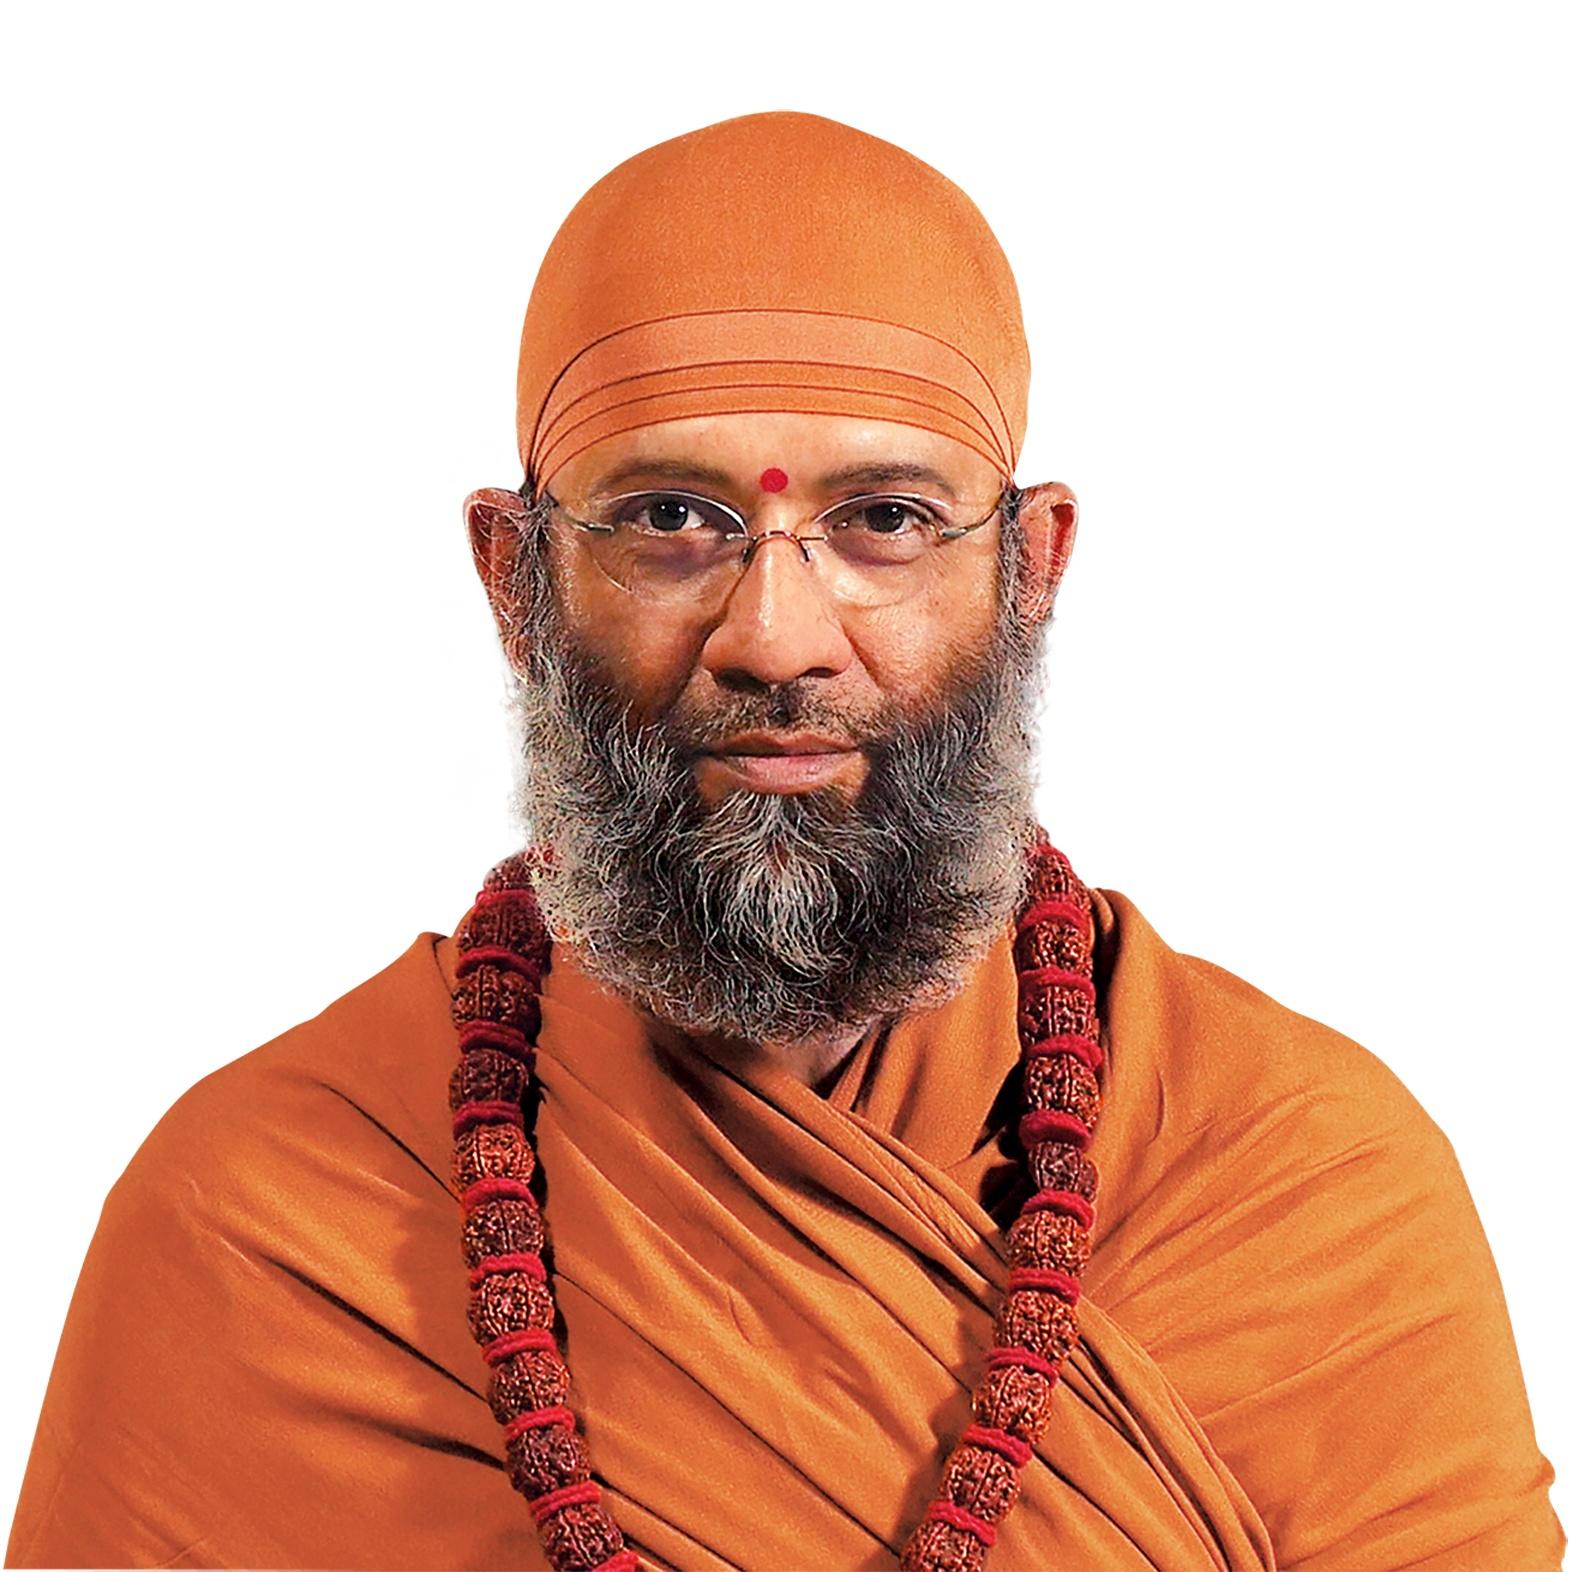 "<p><span class=""font-bold"">His Holiness Swami Vidyadhishananda</span></p>,"